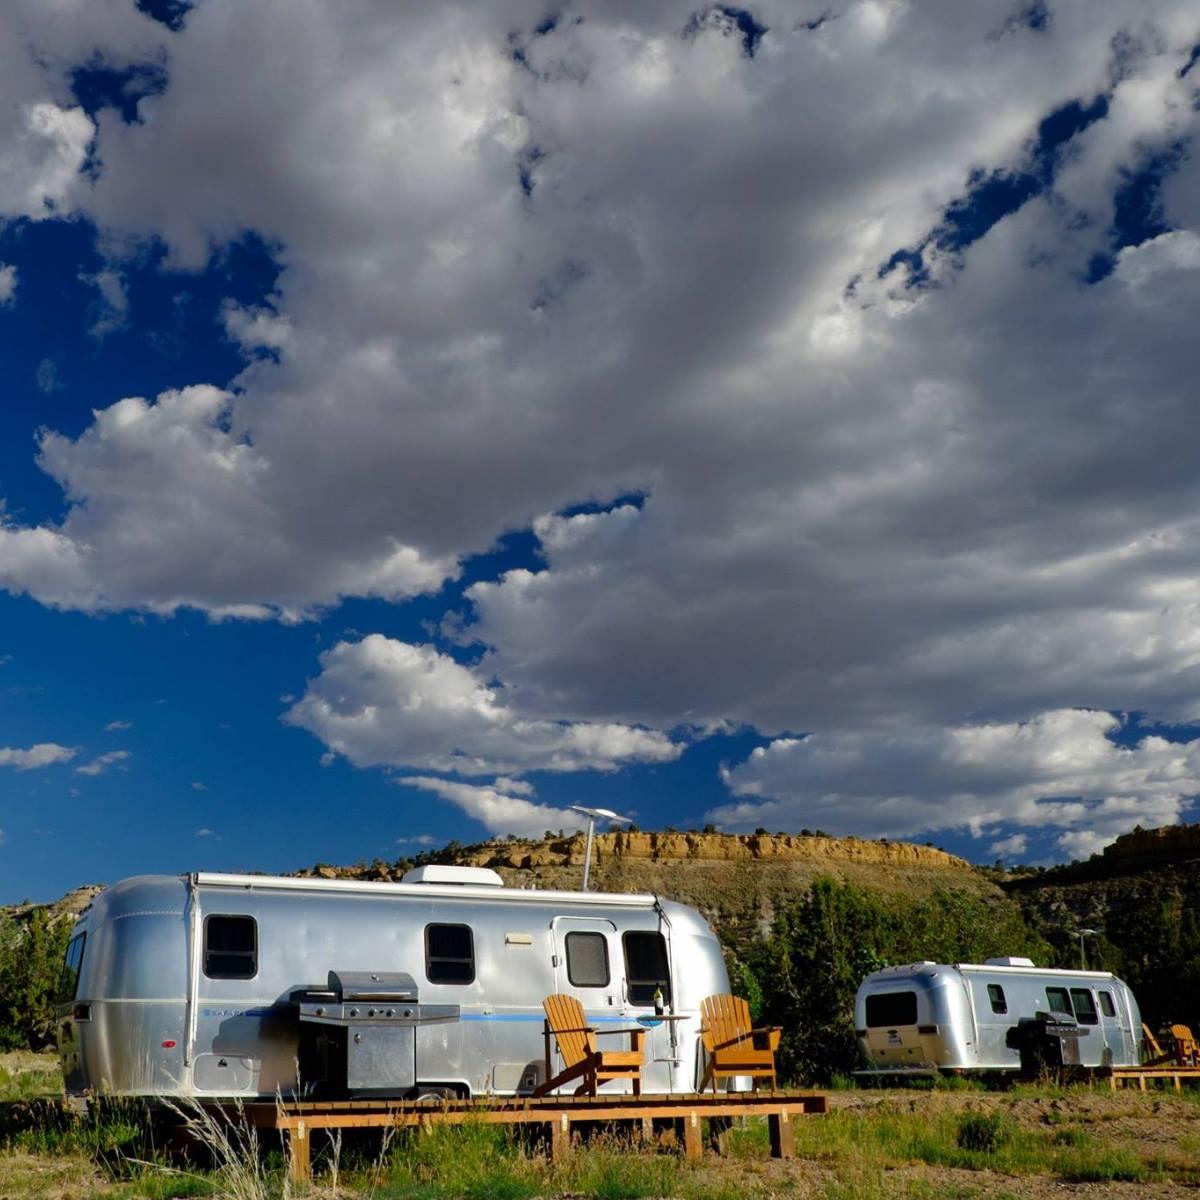 Airstream Hotel - Shooting Star RV Resort